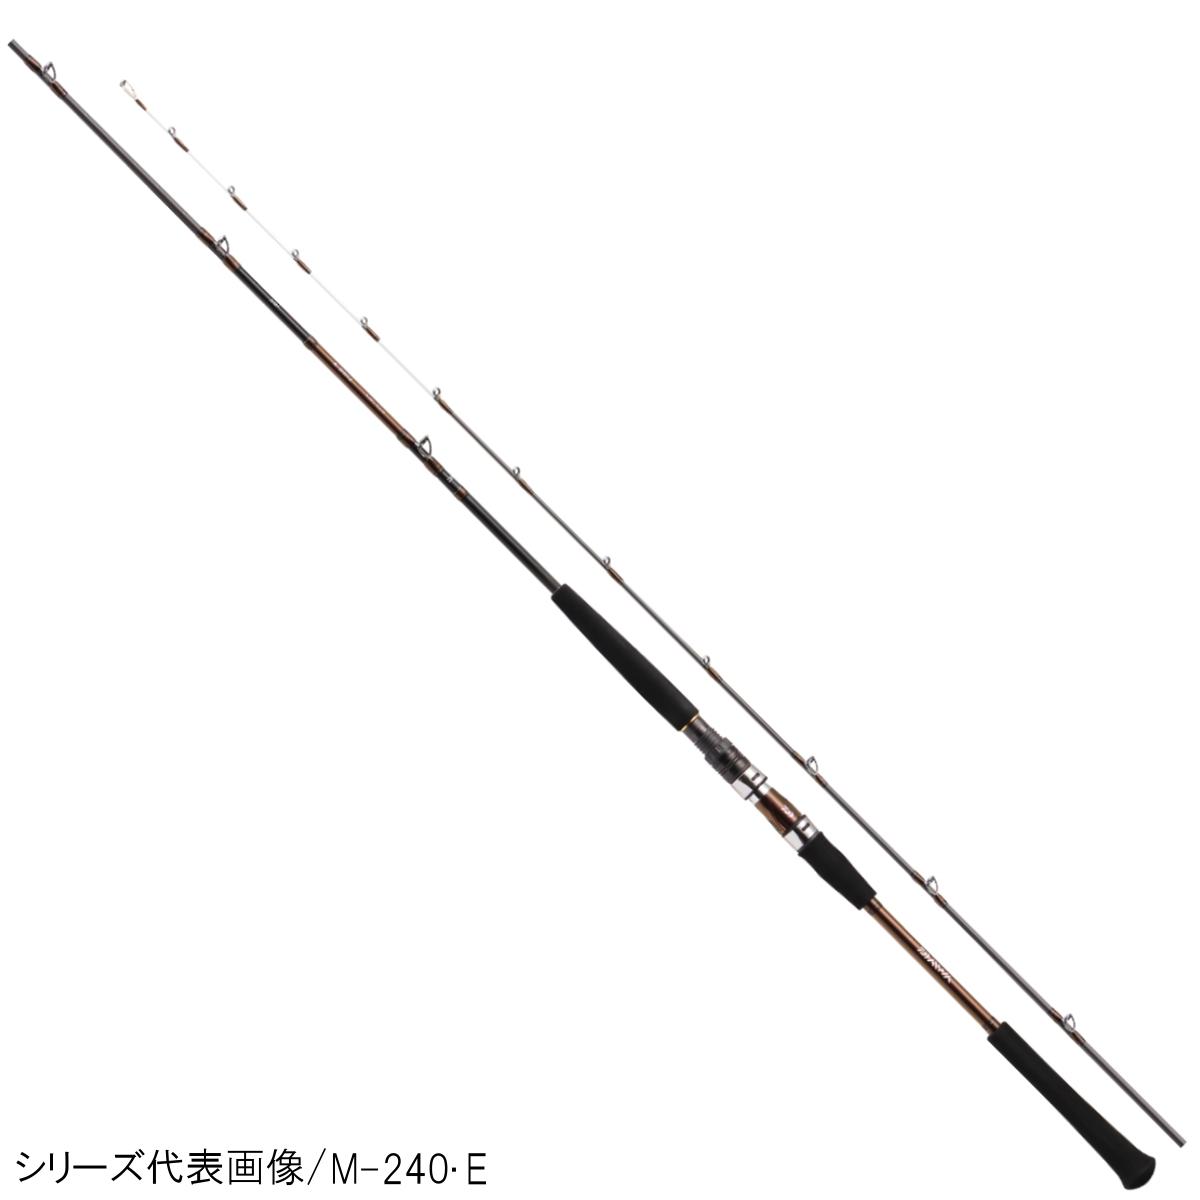 A-ブリッツ ネライ H-180・E ダイワ【同梱不可】